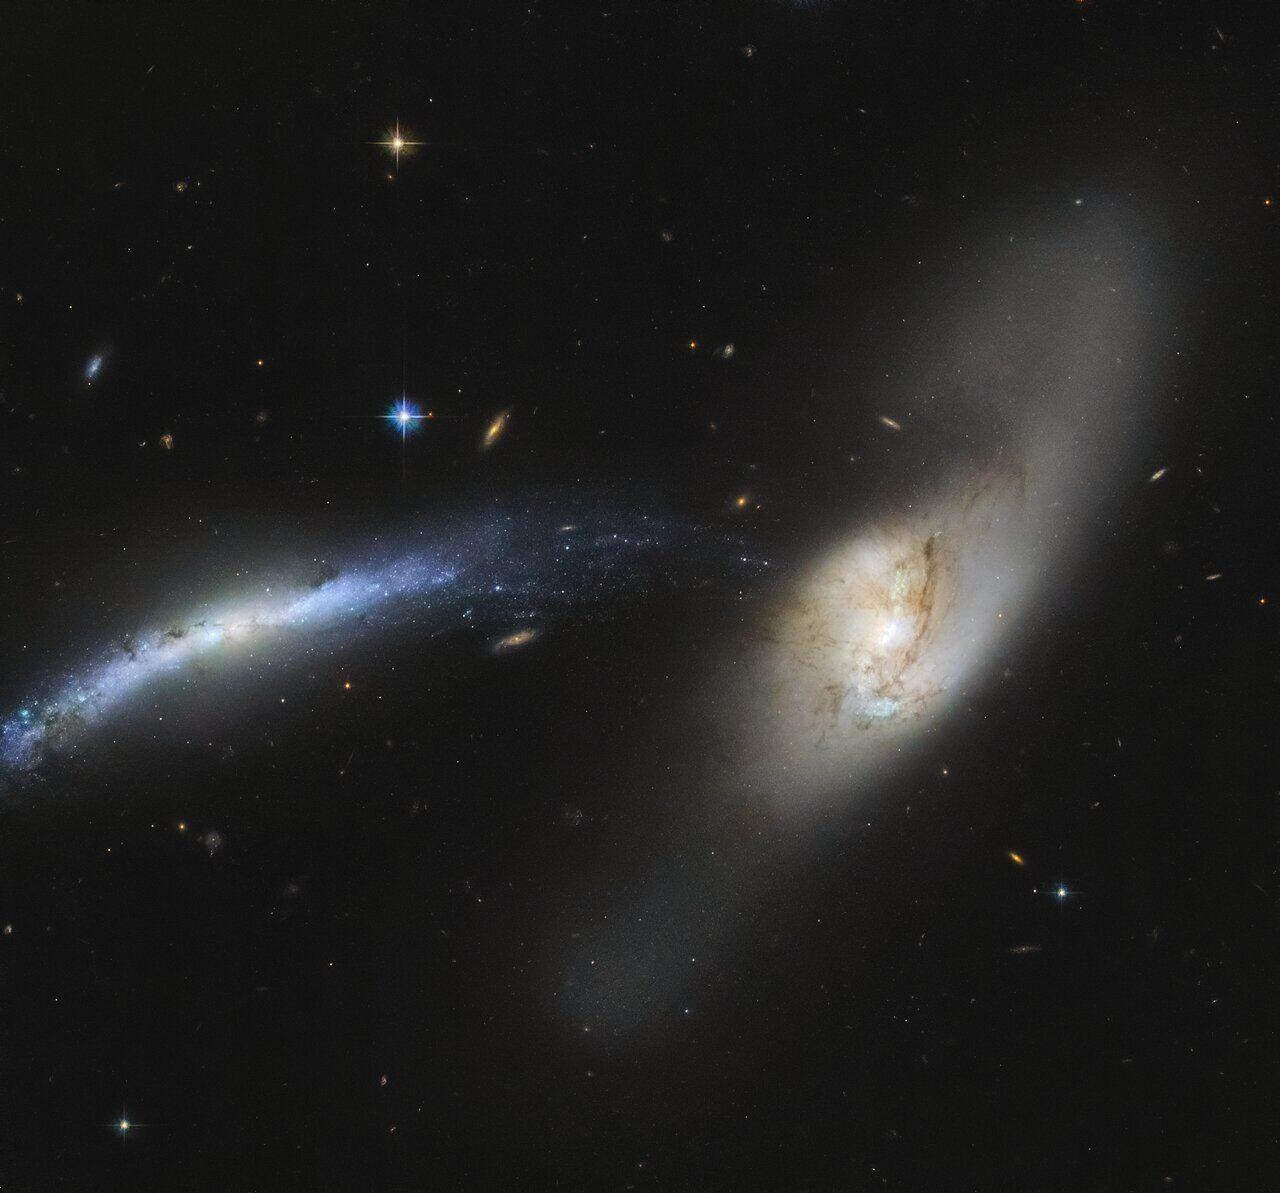 Момент слияния галактик NGC 2799 и NGC 2798